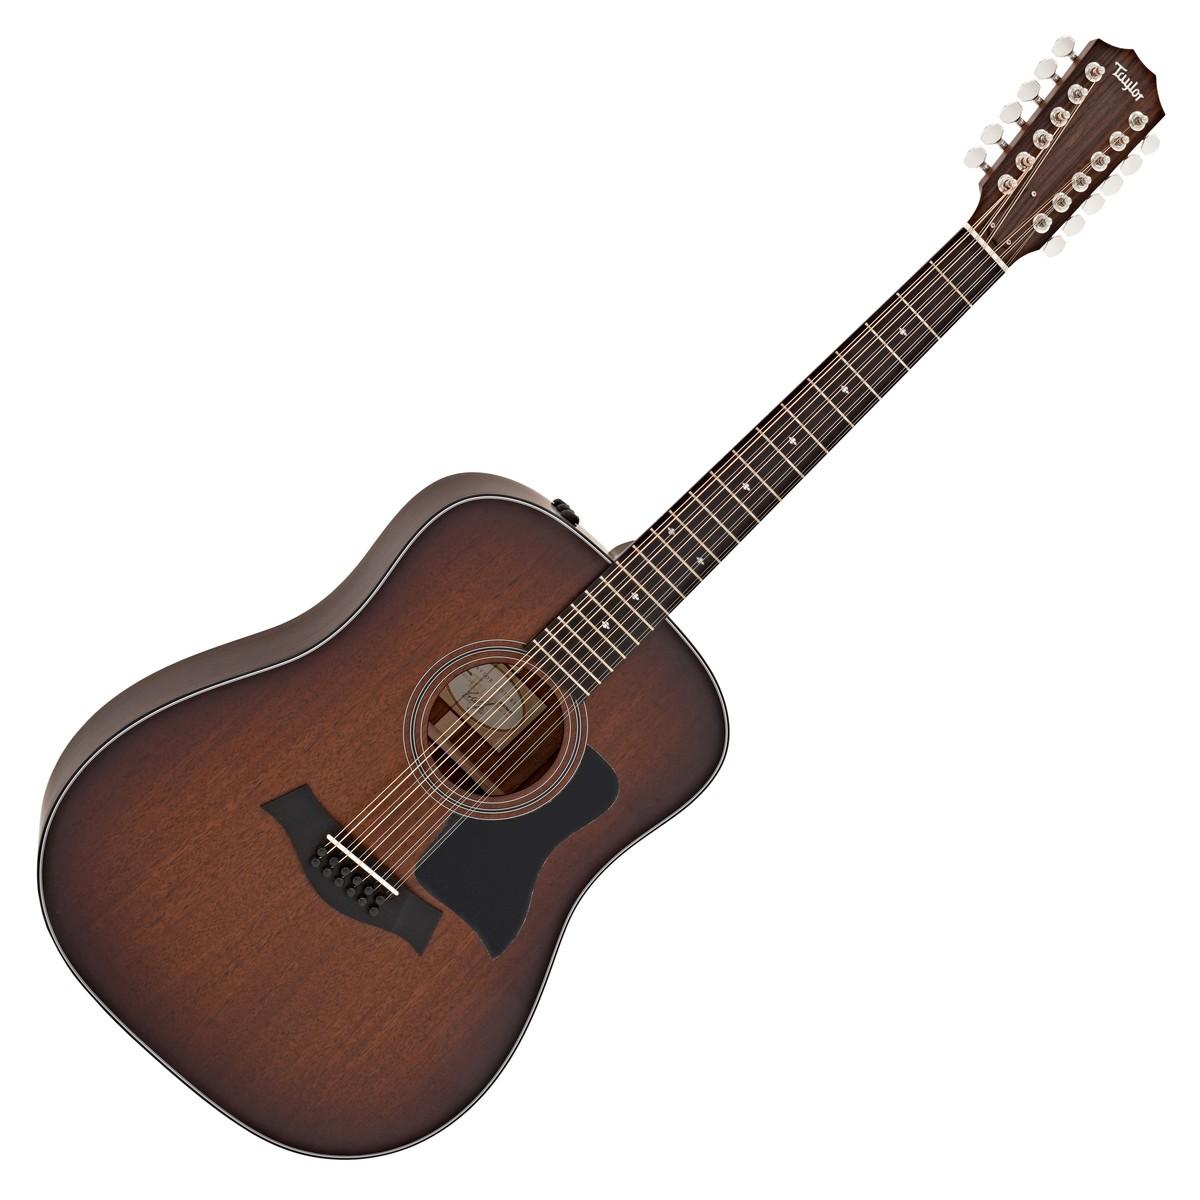 taylor 360e 12 string dreadnought electro acoustic guitar at. Black Bedroom Furniture Sets. Home Design Ideas